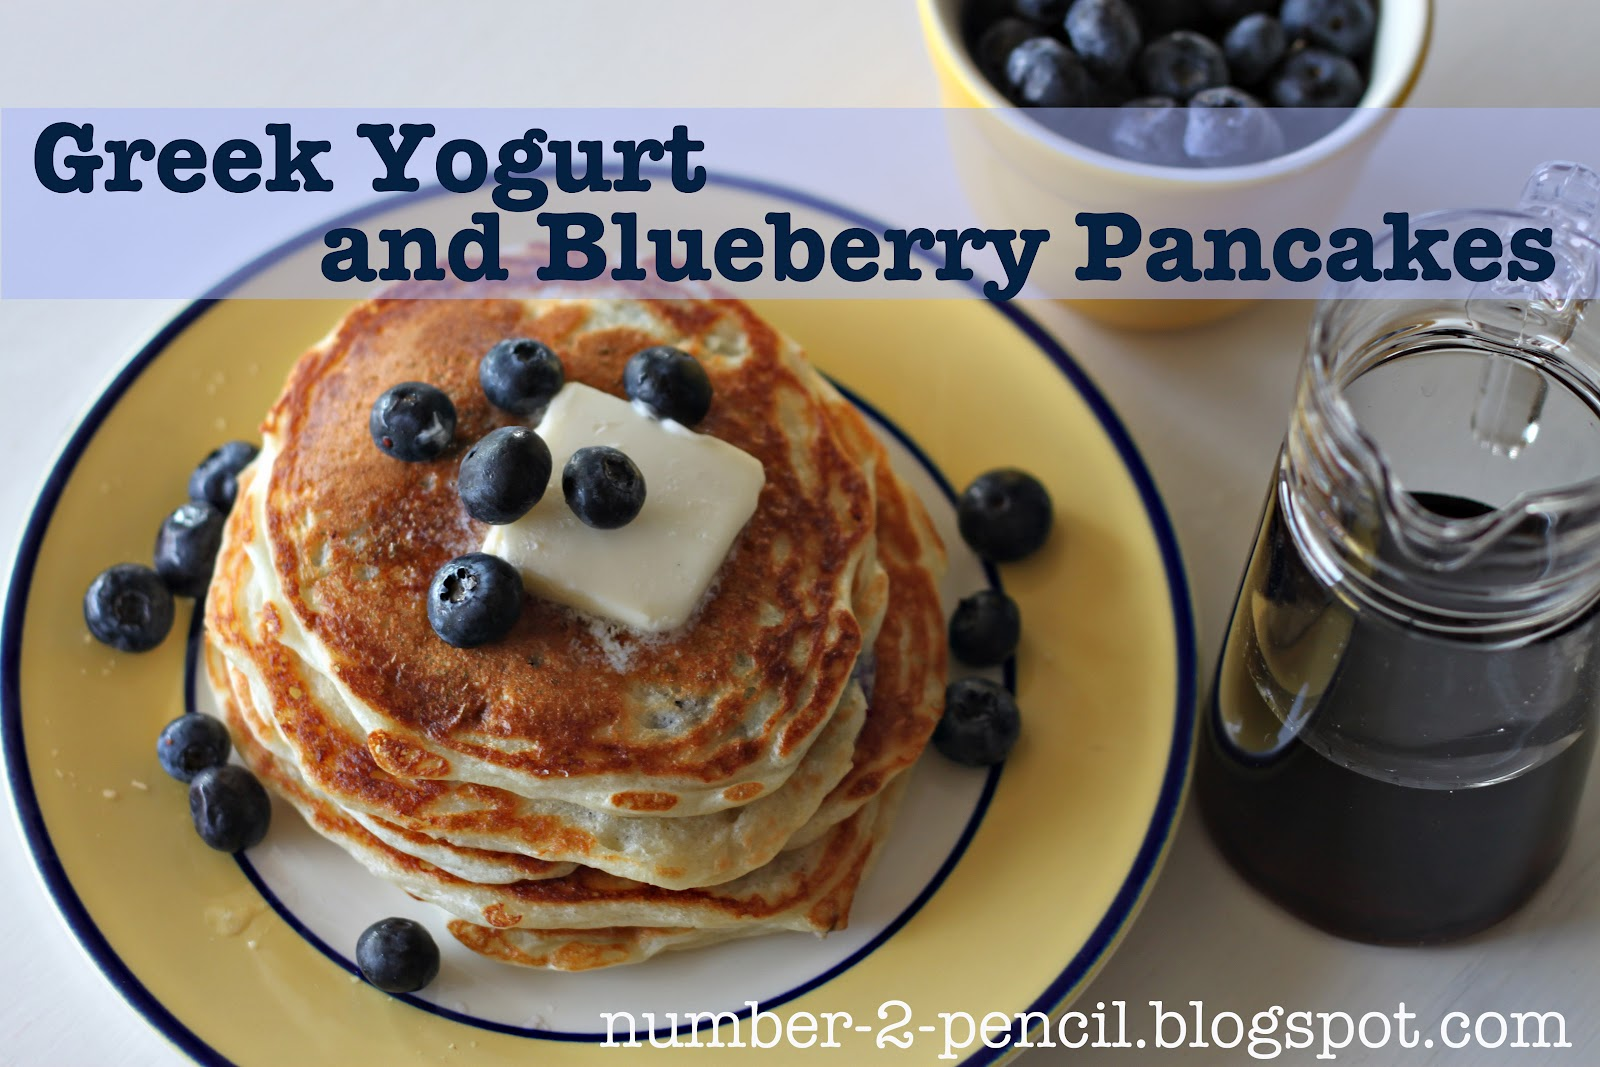 Greek Yogurt and Blueberry Pancakes - No. 2 Pencil